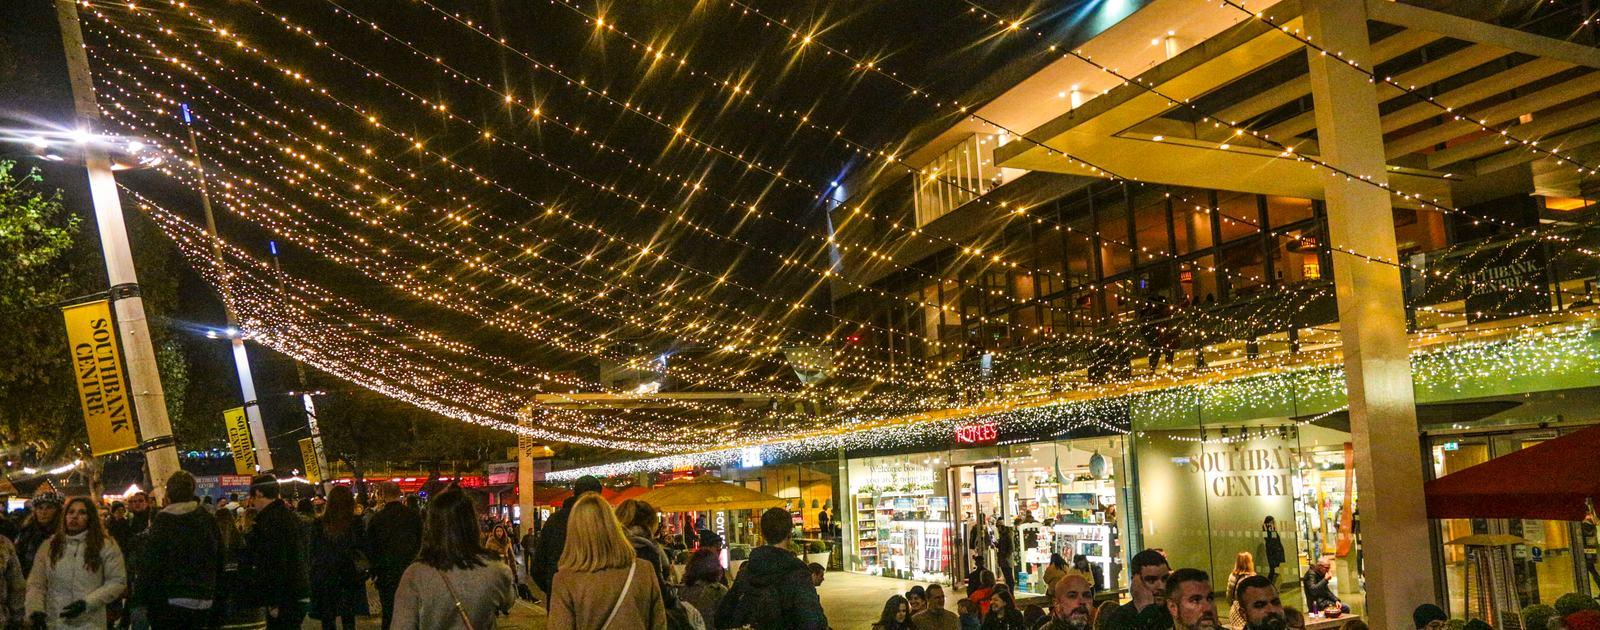 Southbank Centre Winter Market .Riverside Terrace.Shops.Market.Royal Festival Hall